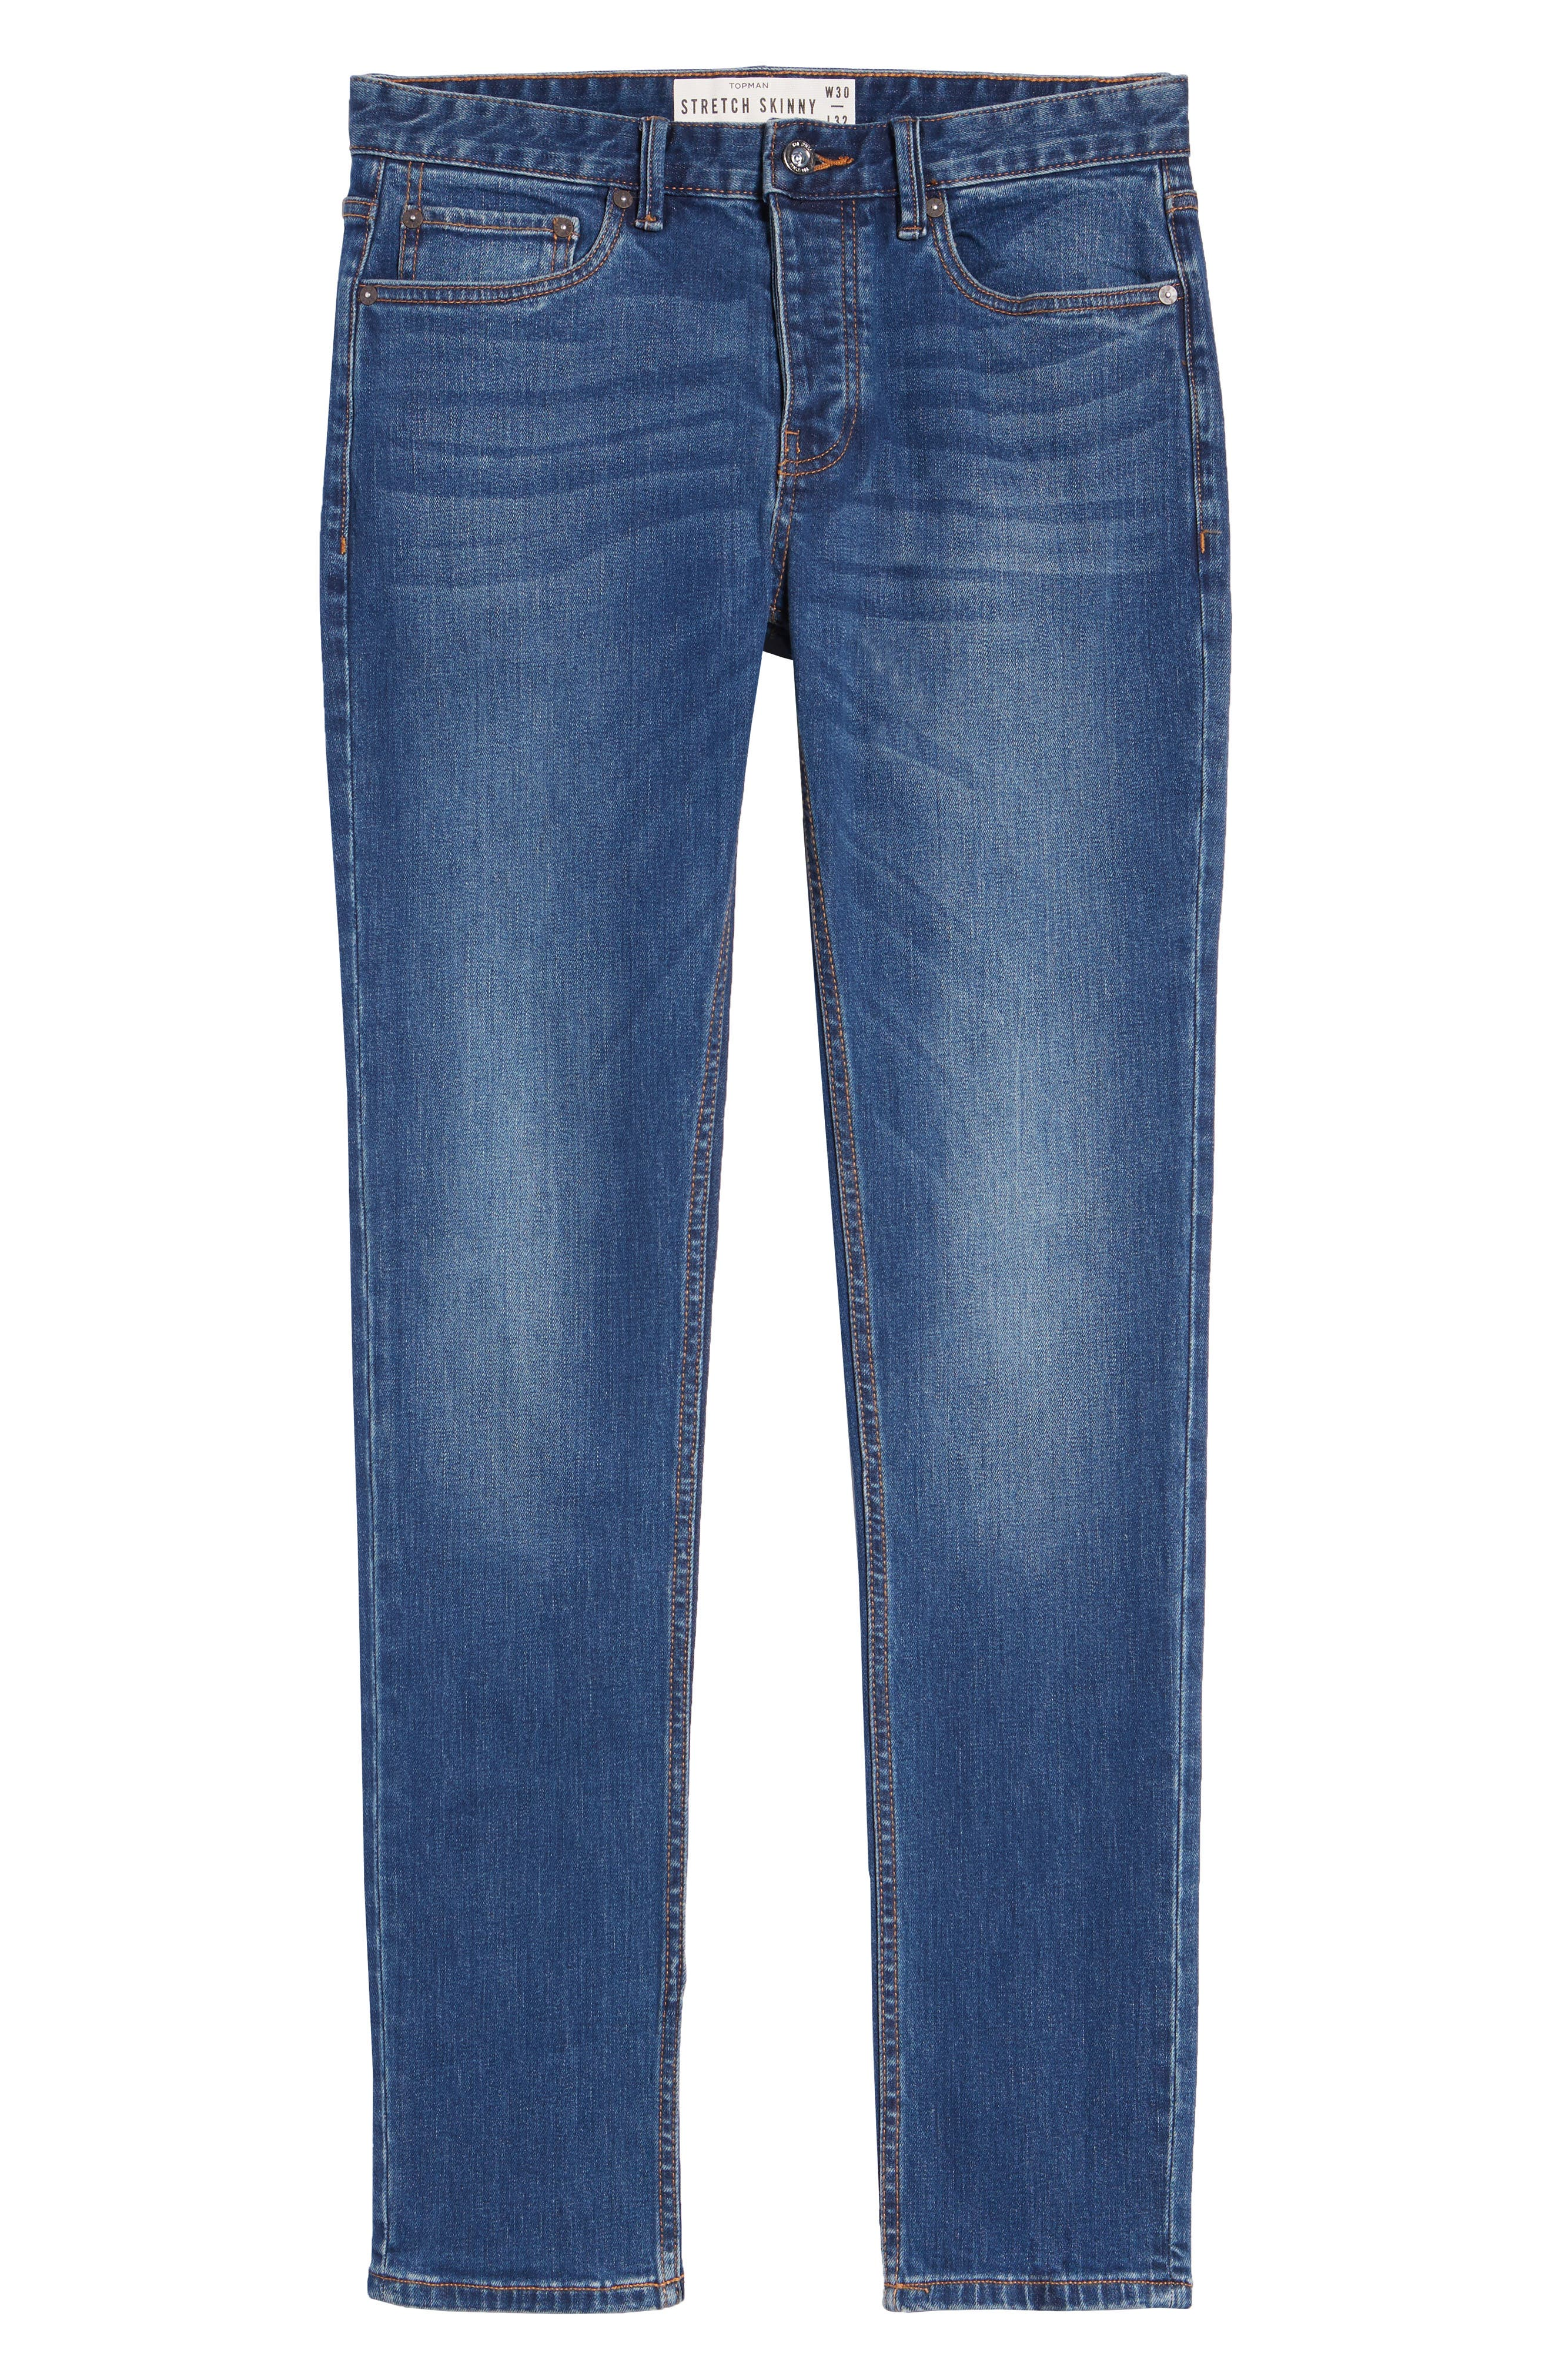 TOPMAN, Stretch Skinny Fit Jeans, Alternate thumbnail 4, color, BLUE